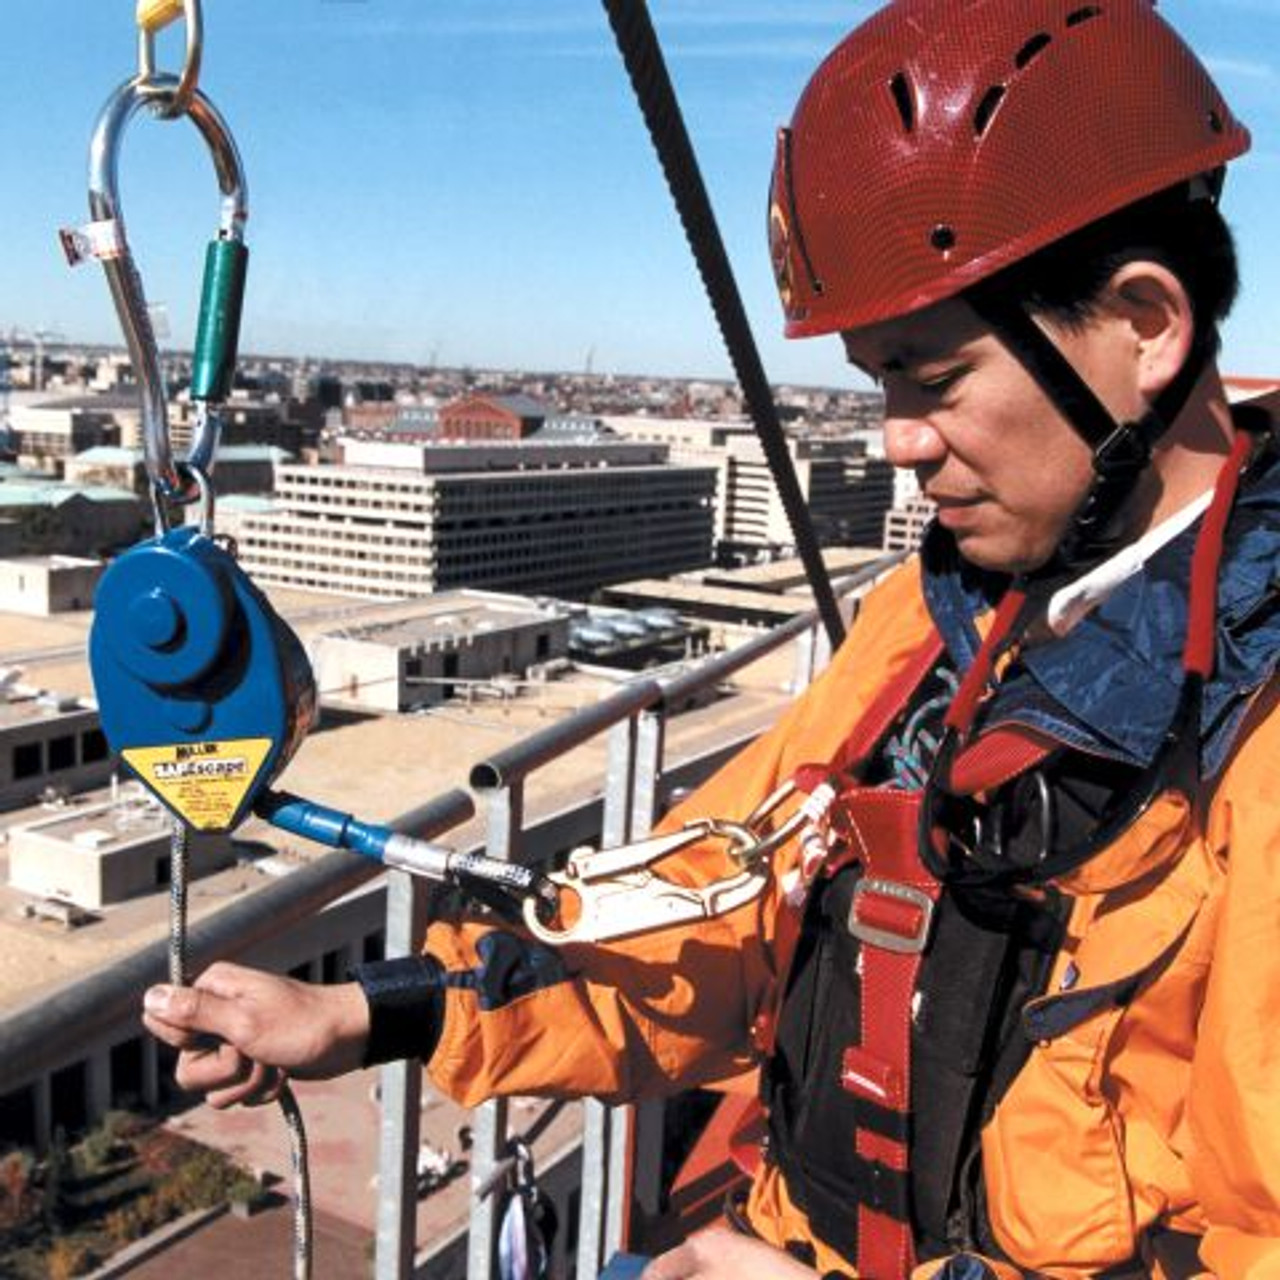 Miller SafEscape Elite Rescue/Descent Device Crane Rescue Kit [50FT - 650FT] SECRKT/ - Jendco Safety Supply